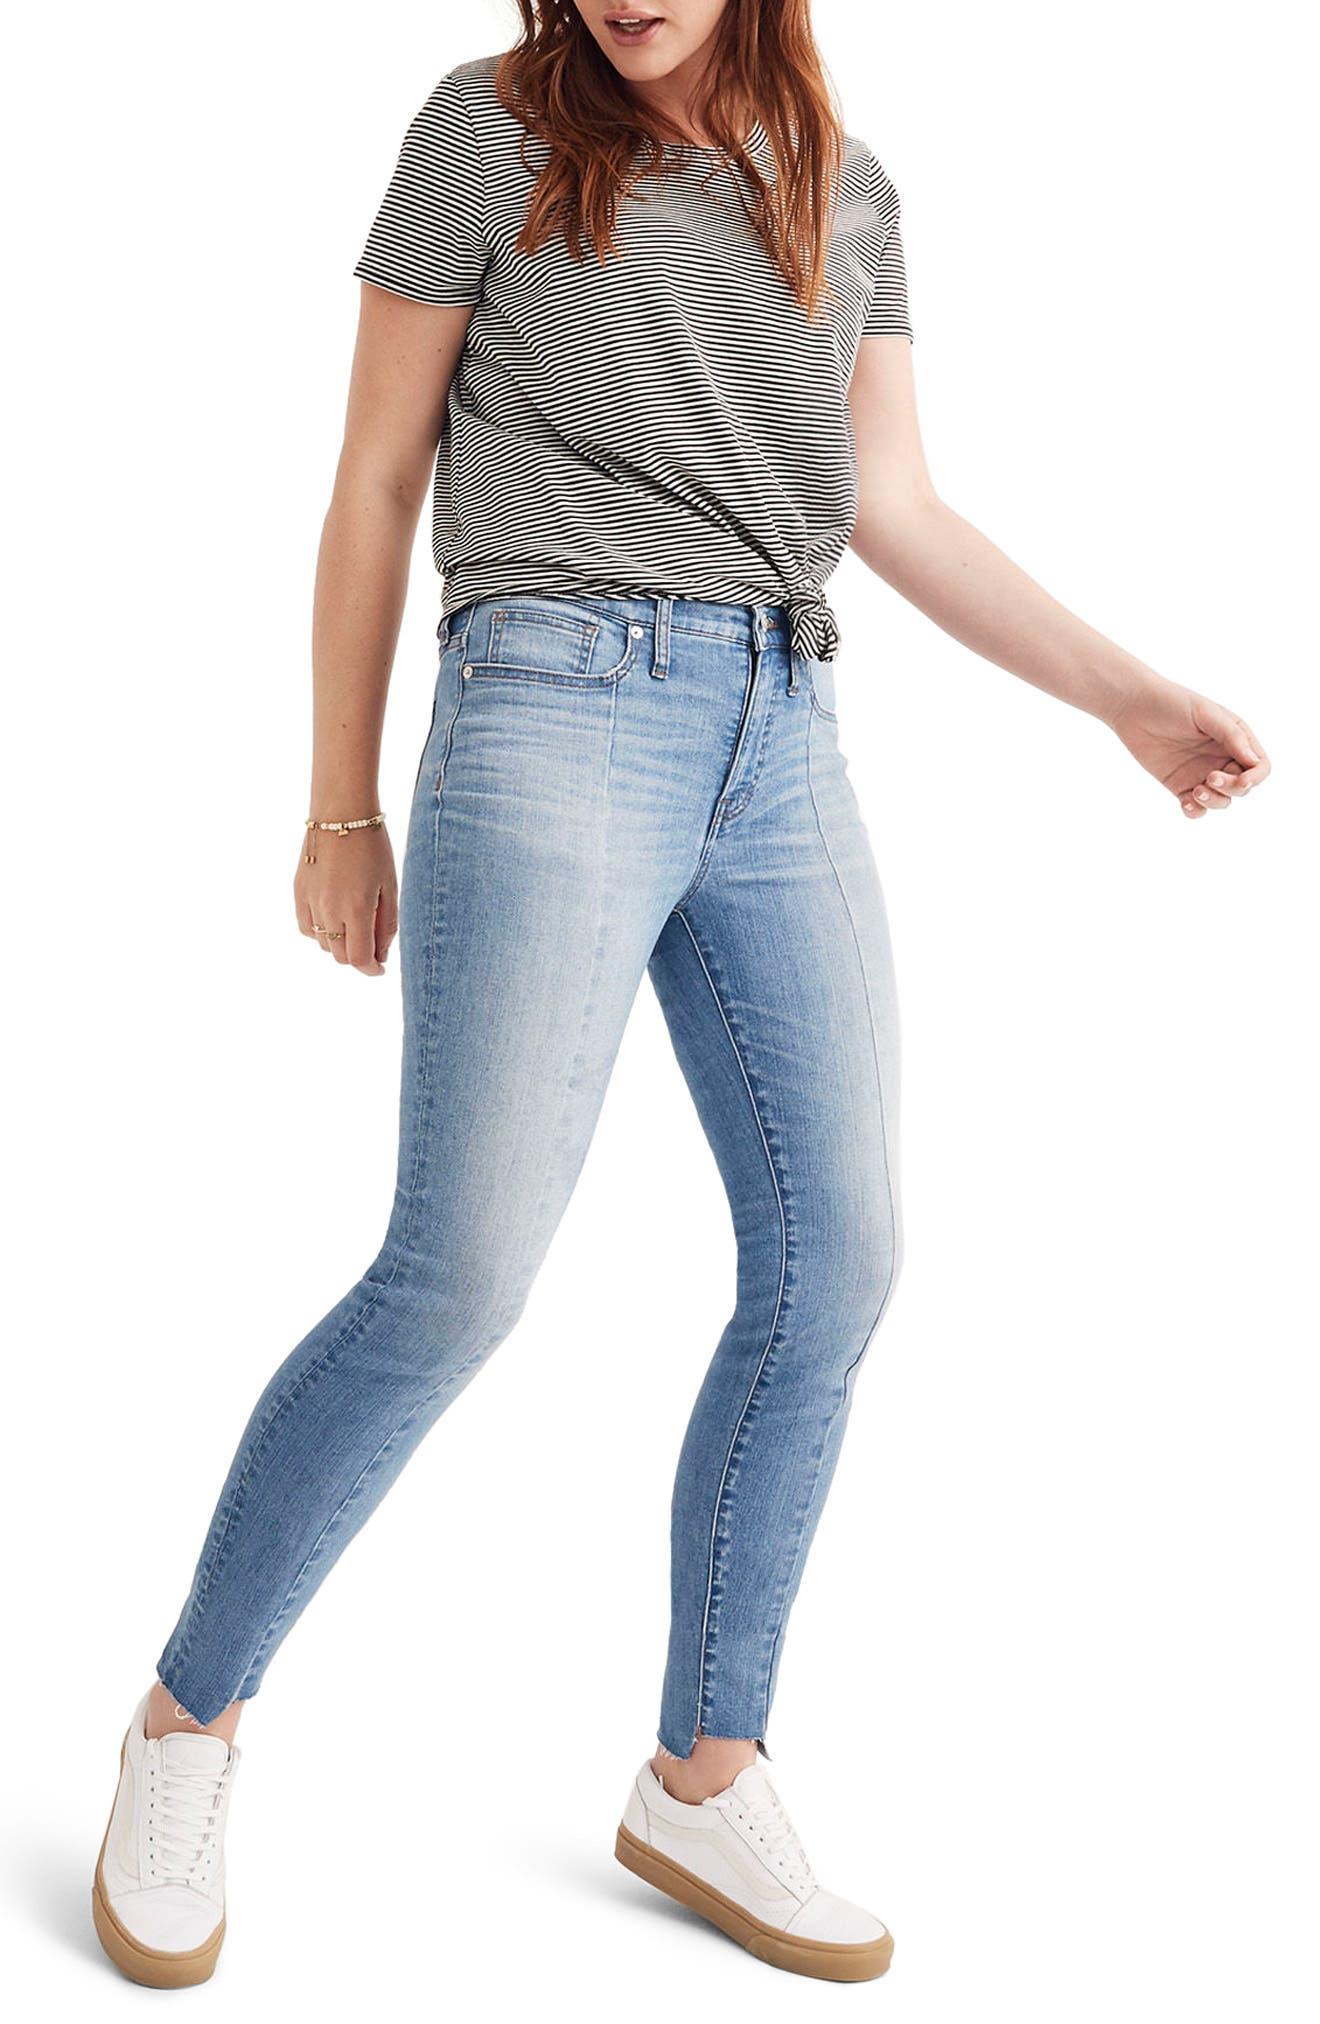 MADEWELL, 9-Inch High Waist Seamed Step-Hem Edition Skinny Jeans, Main thumbnail 1, color, 400